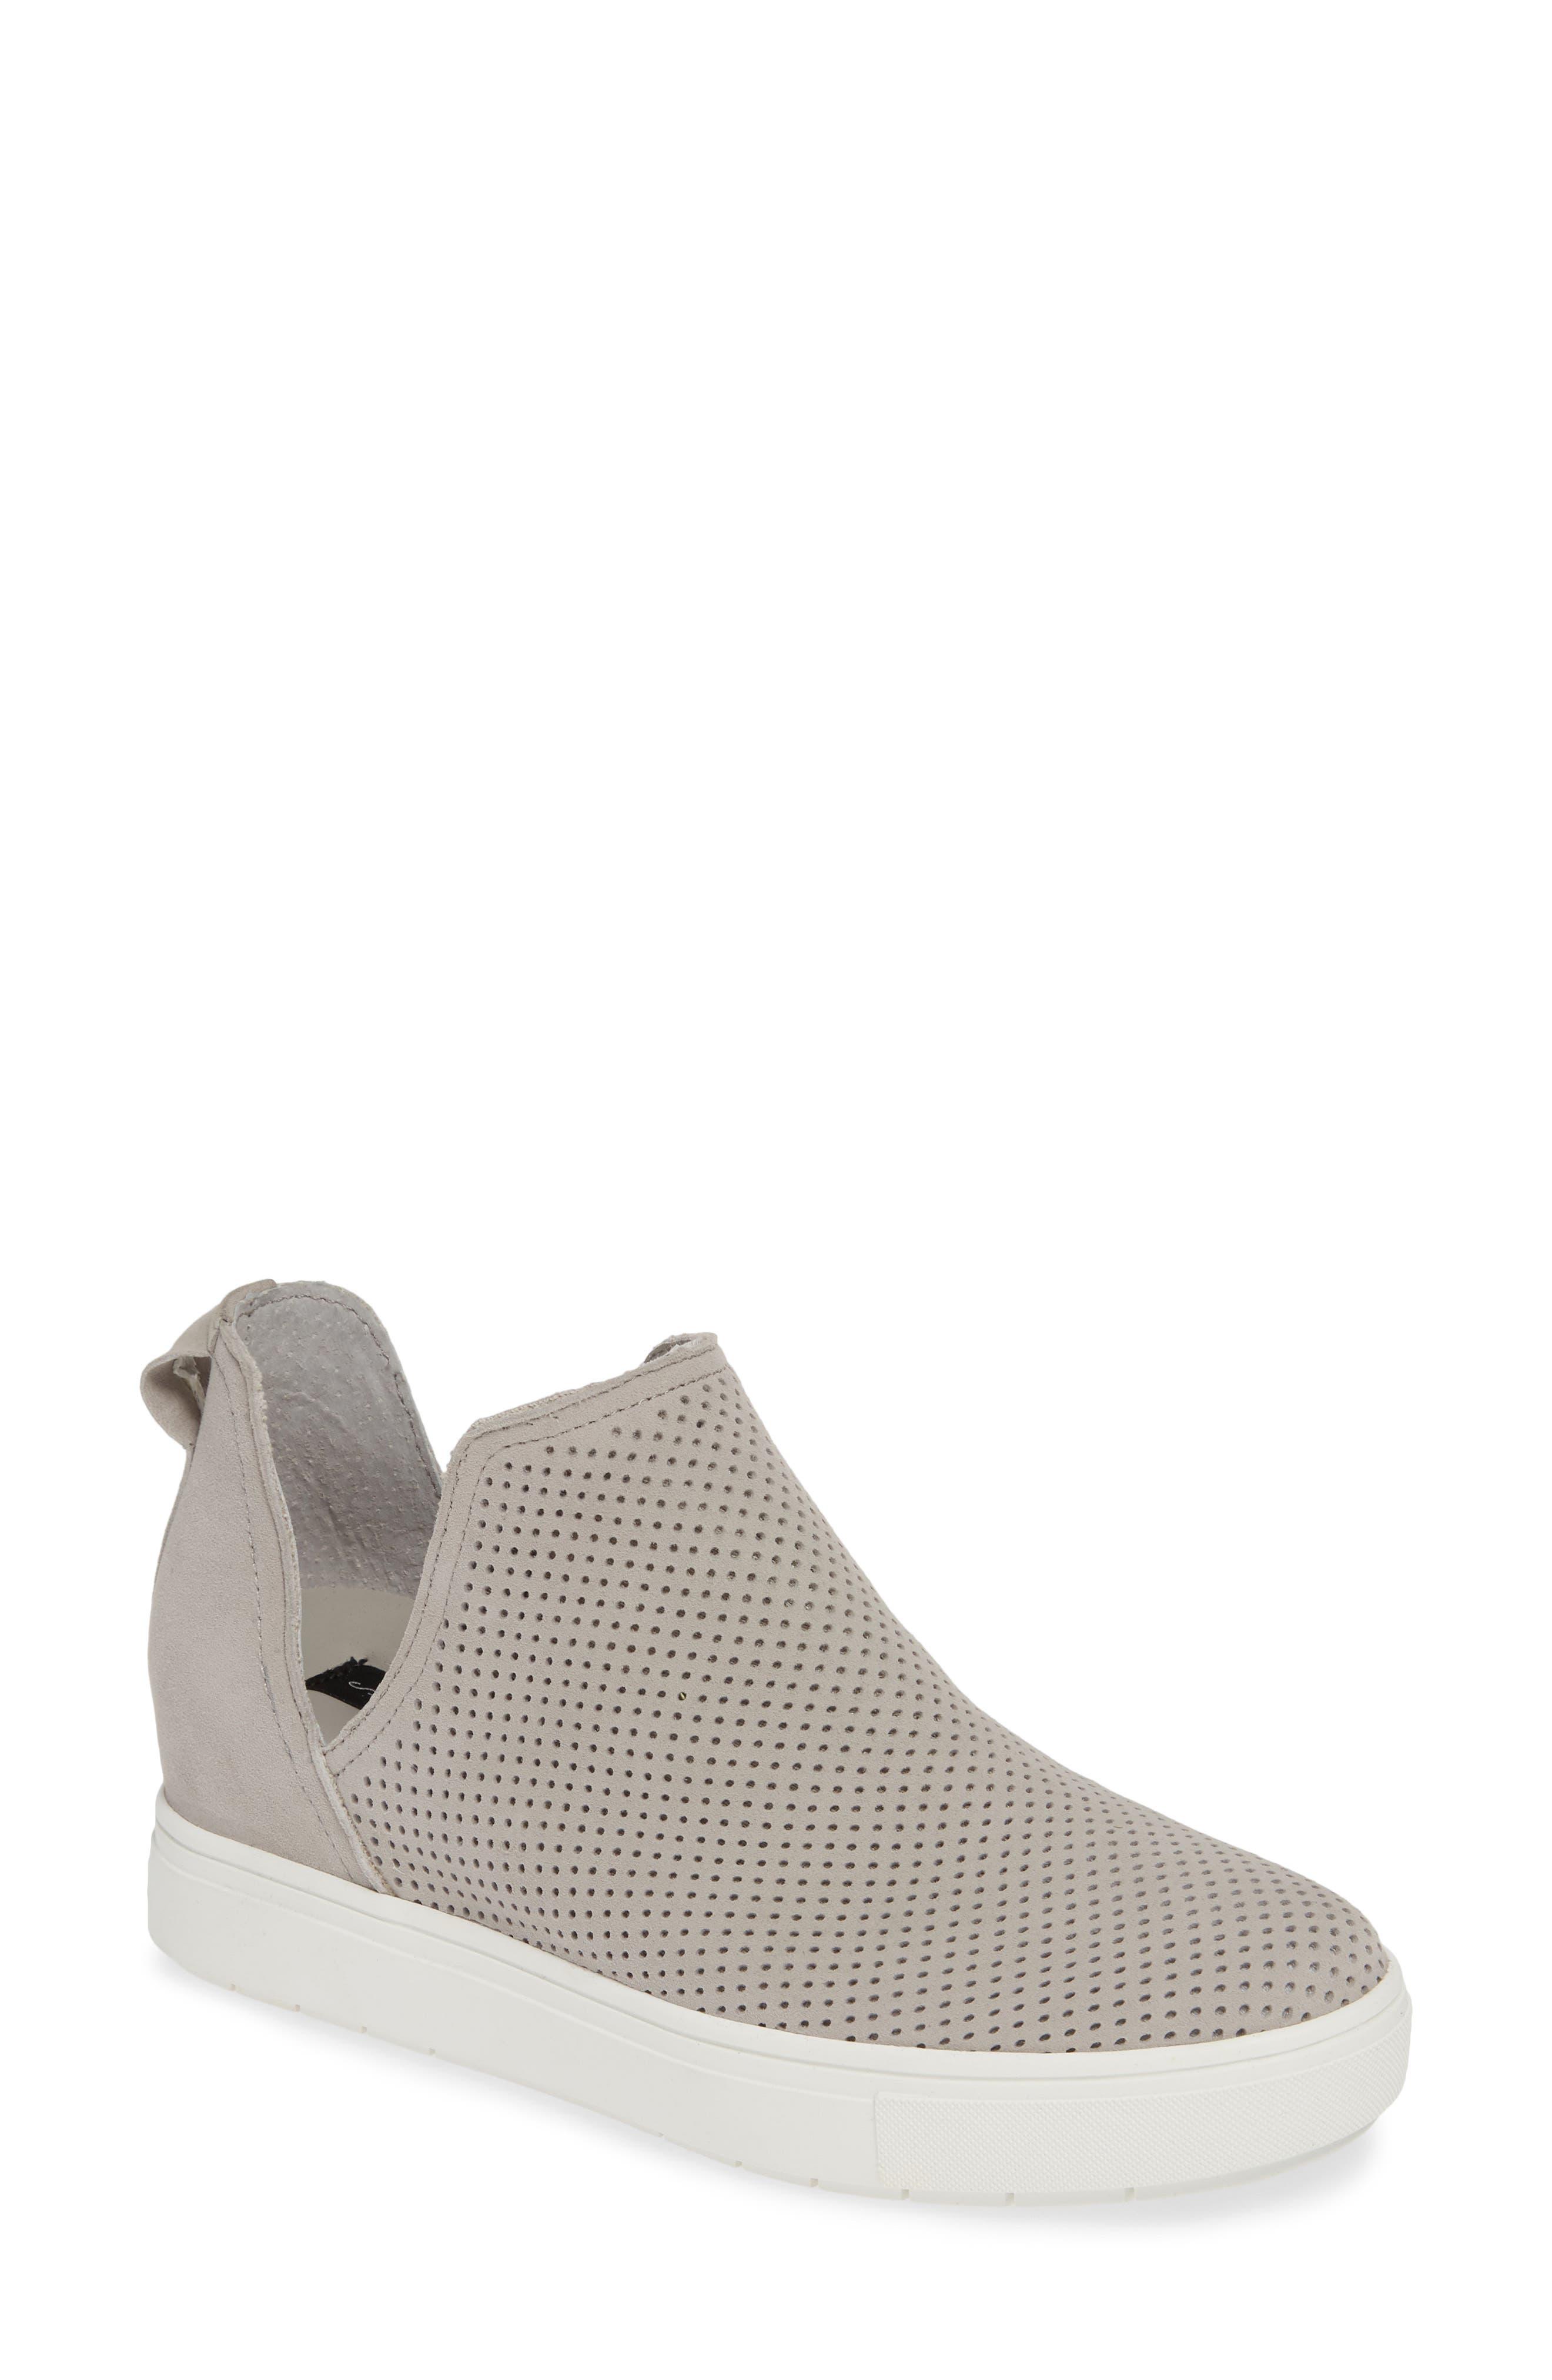 Steven By Steve Madden Canares High Top Sneaker, Grey